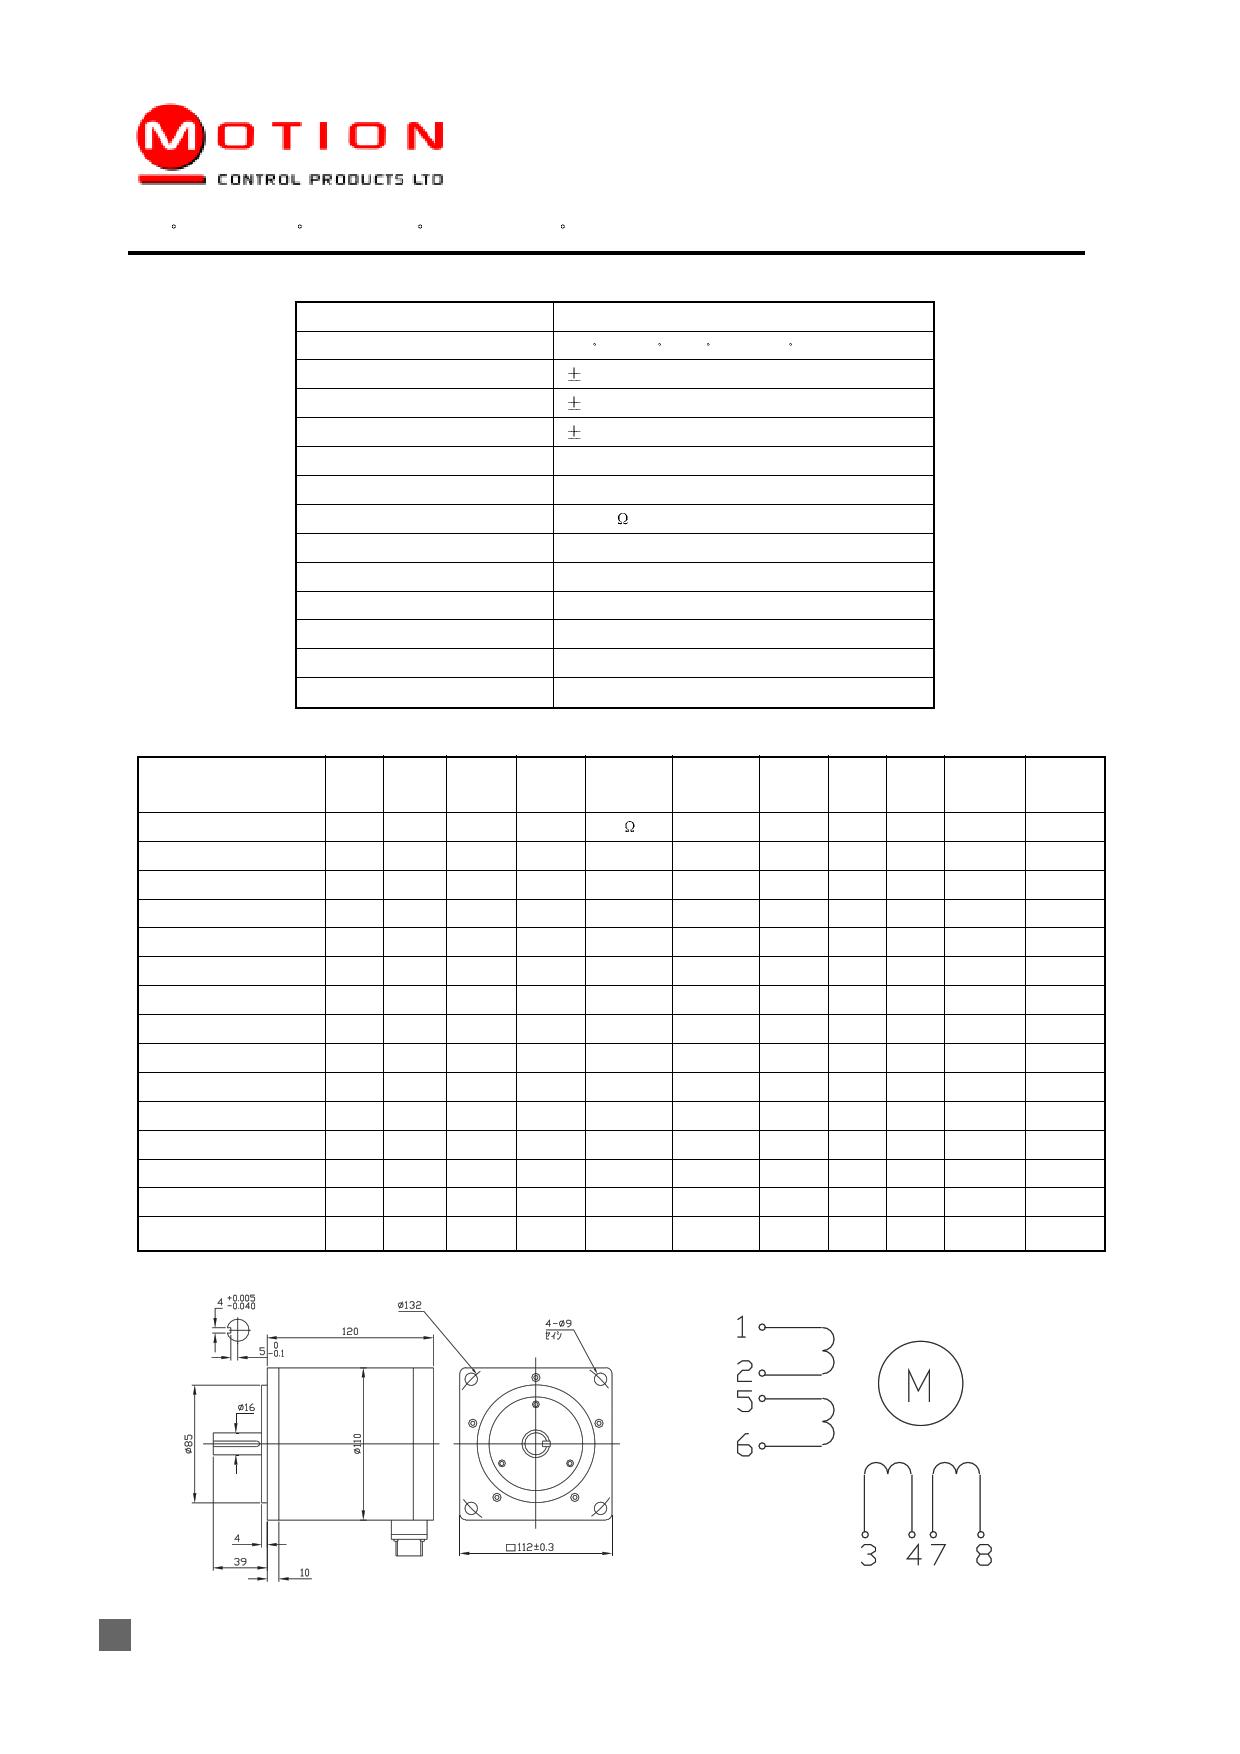 FL110ST192-50010MA Datasheet, FL110ST192-50010MA PDF,ピン配置, 機能